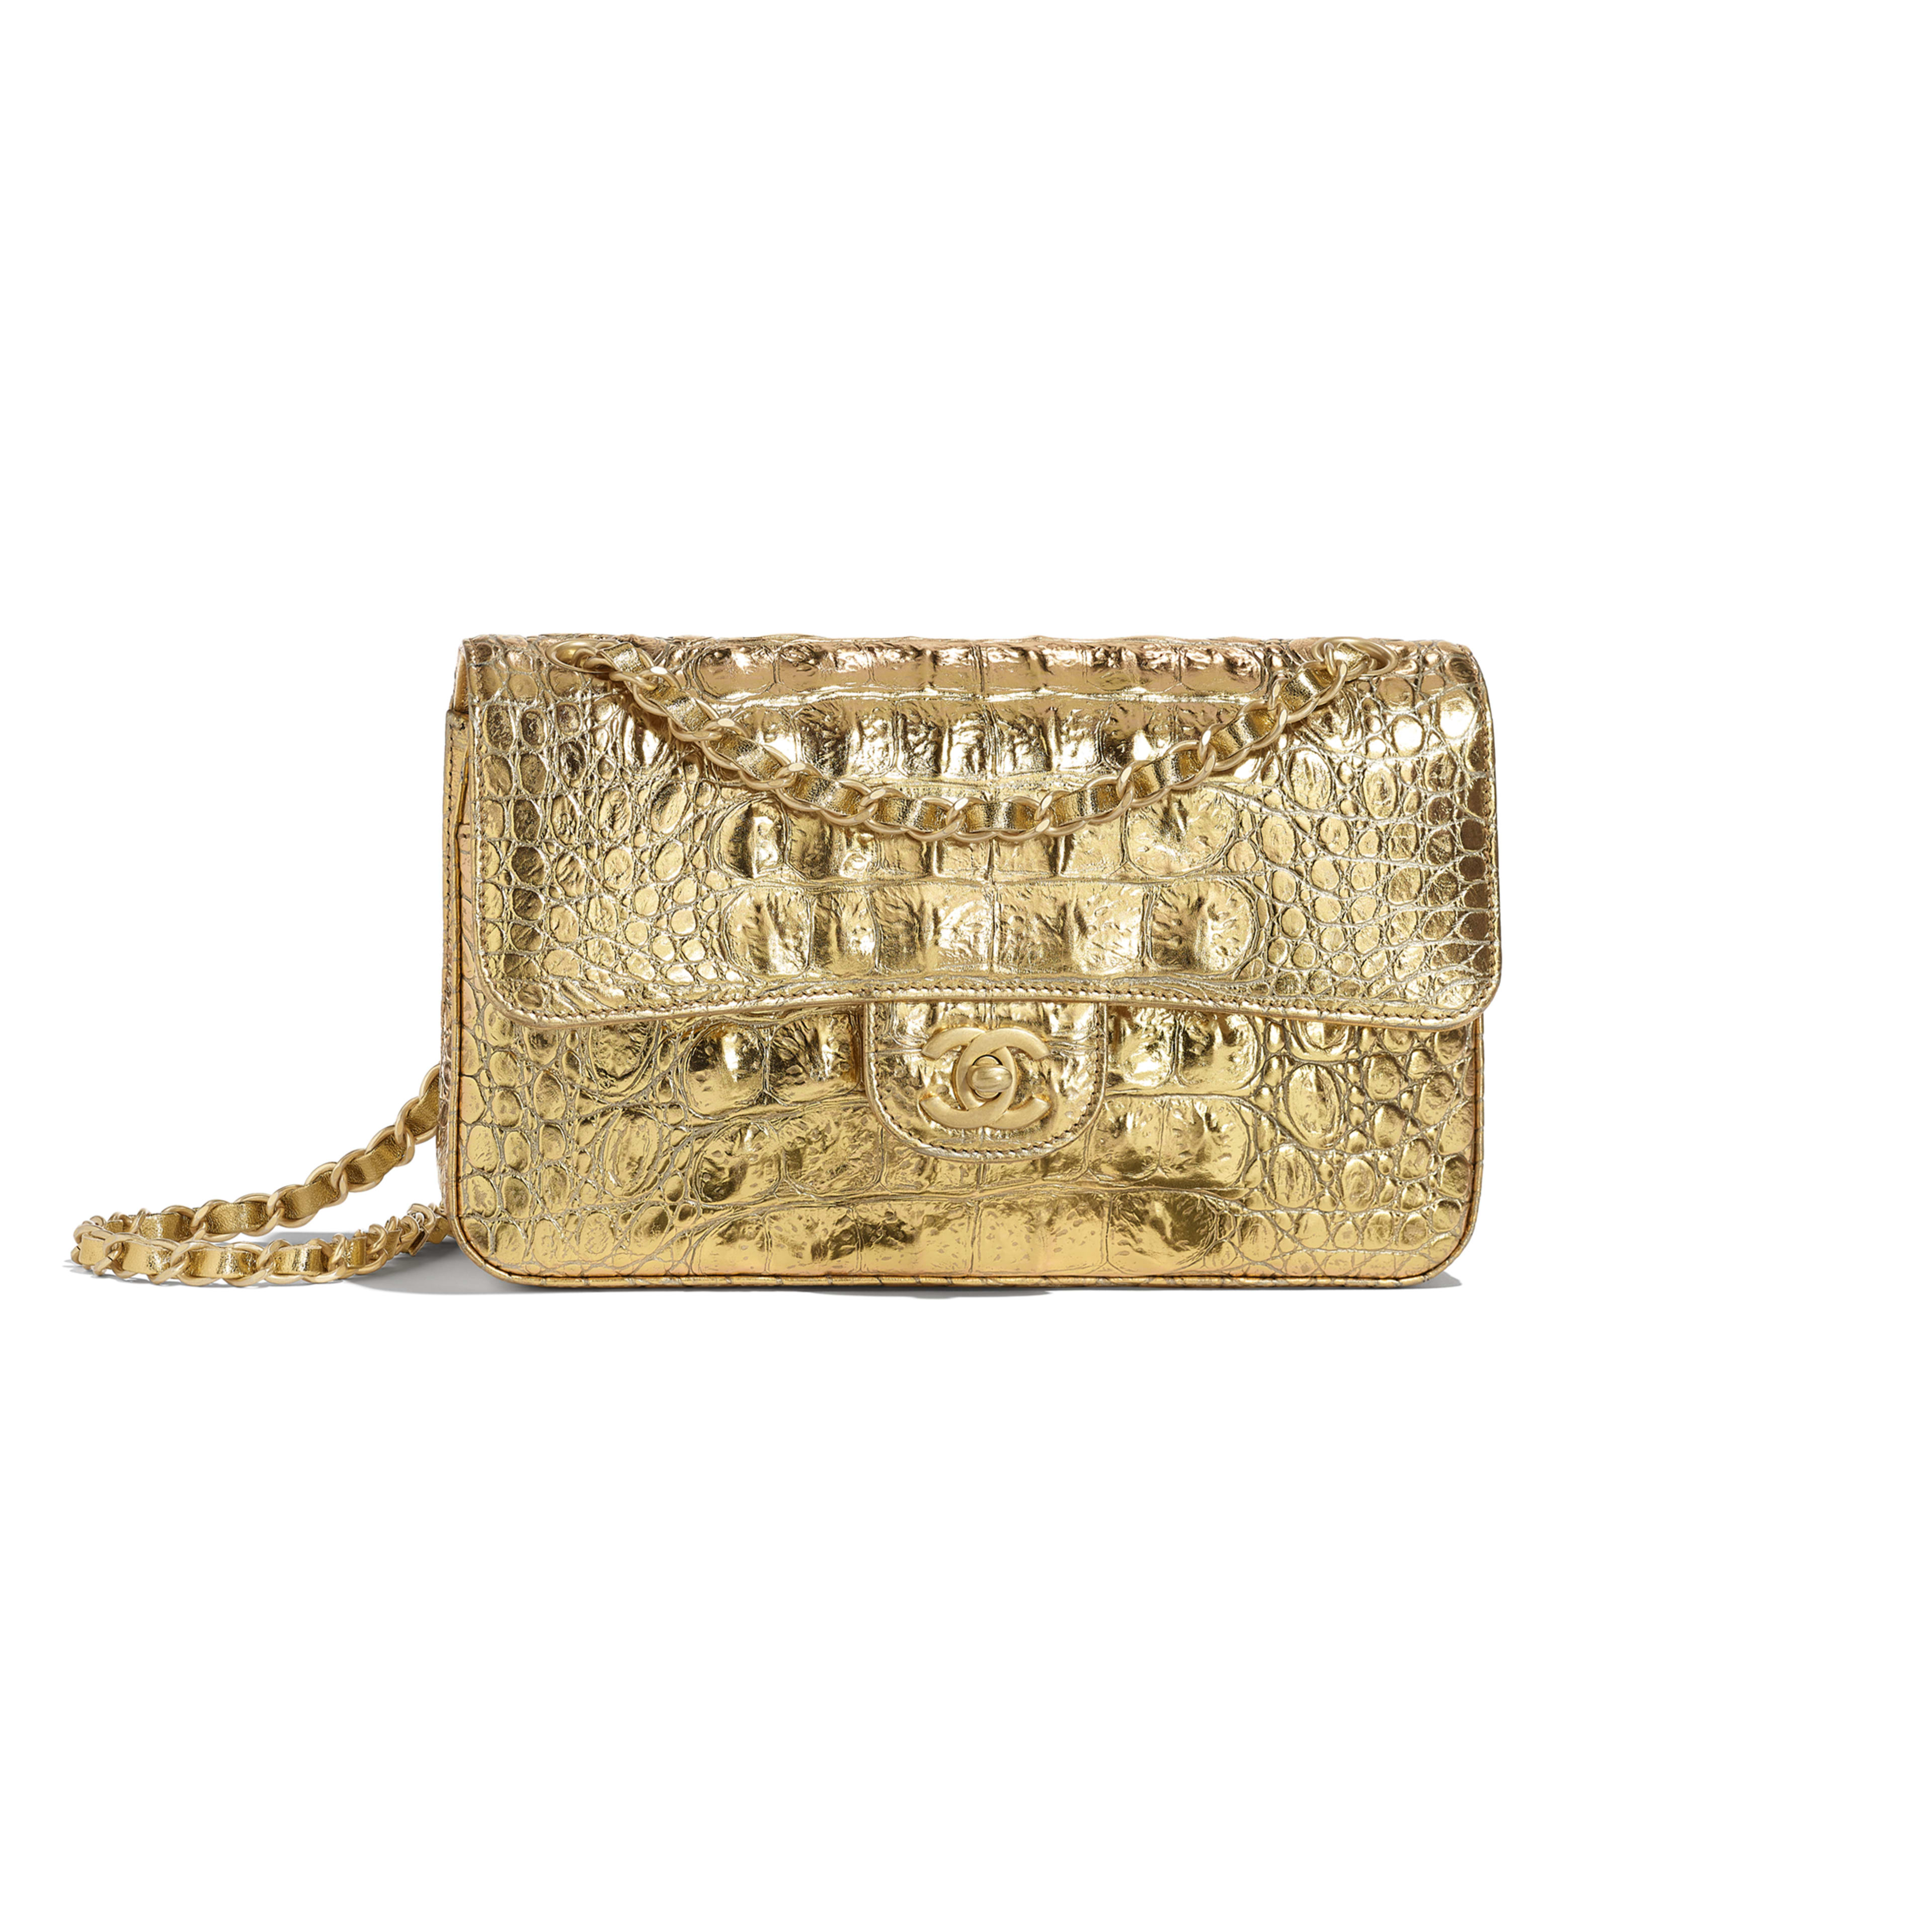 Small Classic Handbag - Gold - Metallic Crocodile Embossed Calfskin & Gold Metal - Default view - see full sized version